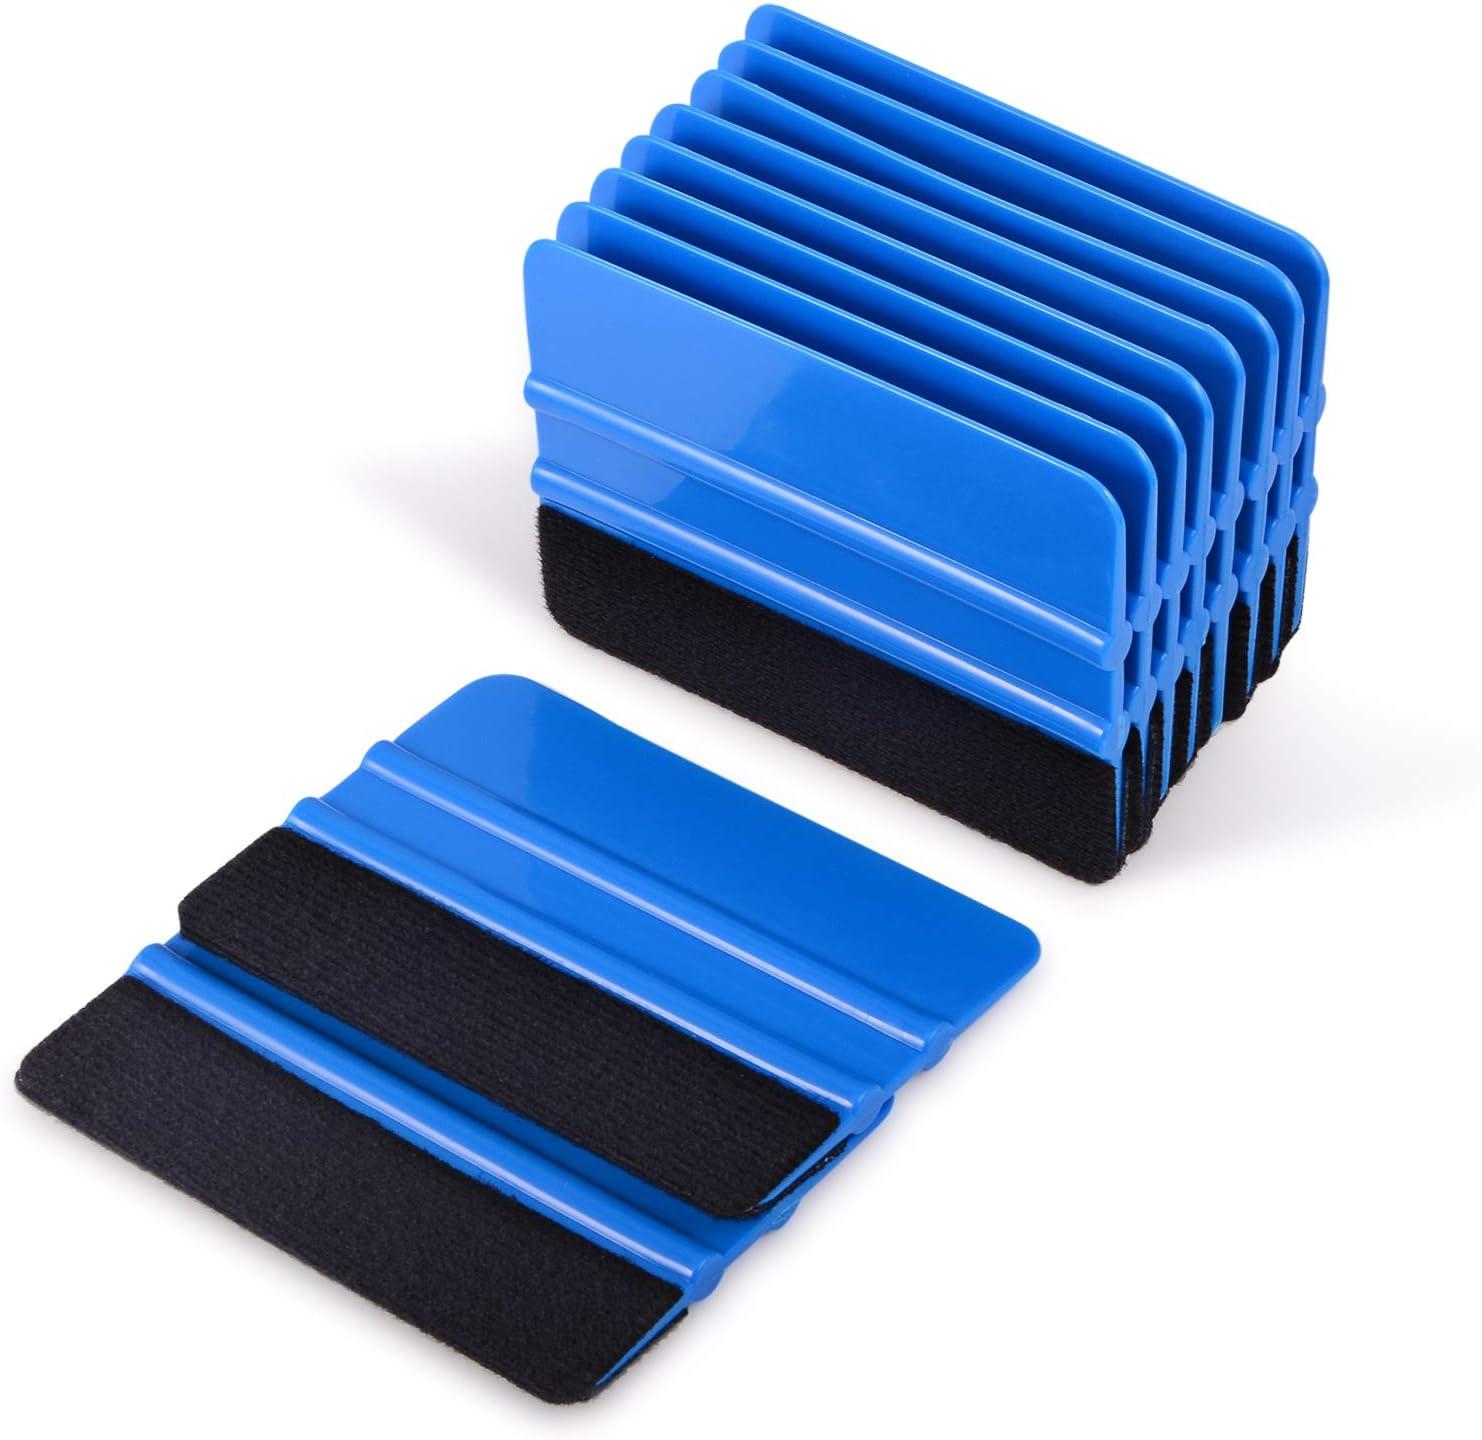 Blue Car Window Scraper,Felt Wrapping Squeegee Applicator Tool